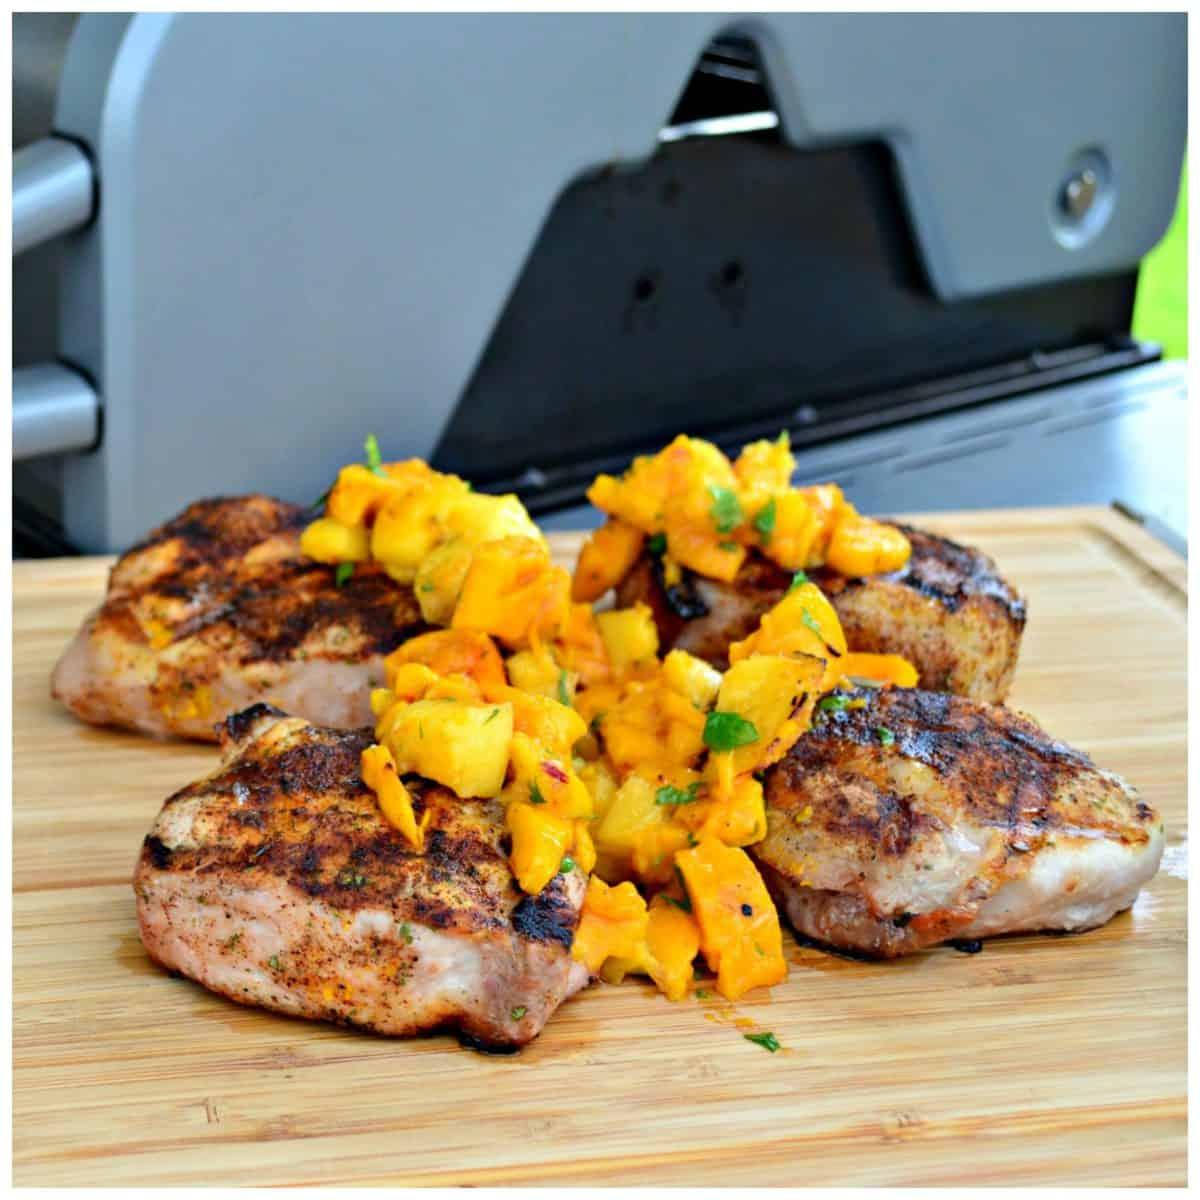 Grilled Southwestern Pork Chops With Mango Peach Salsa